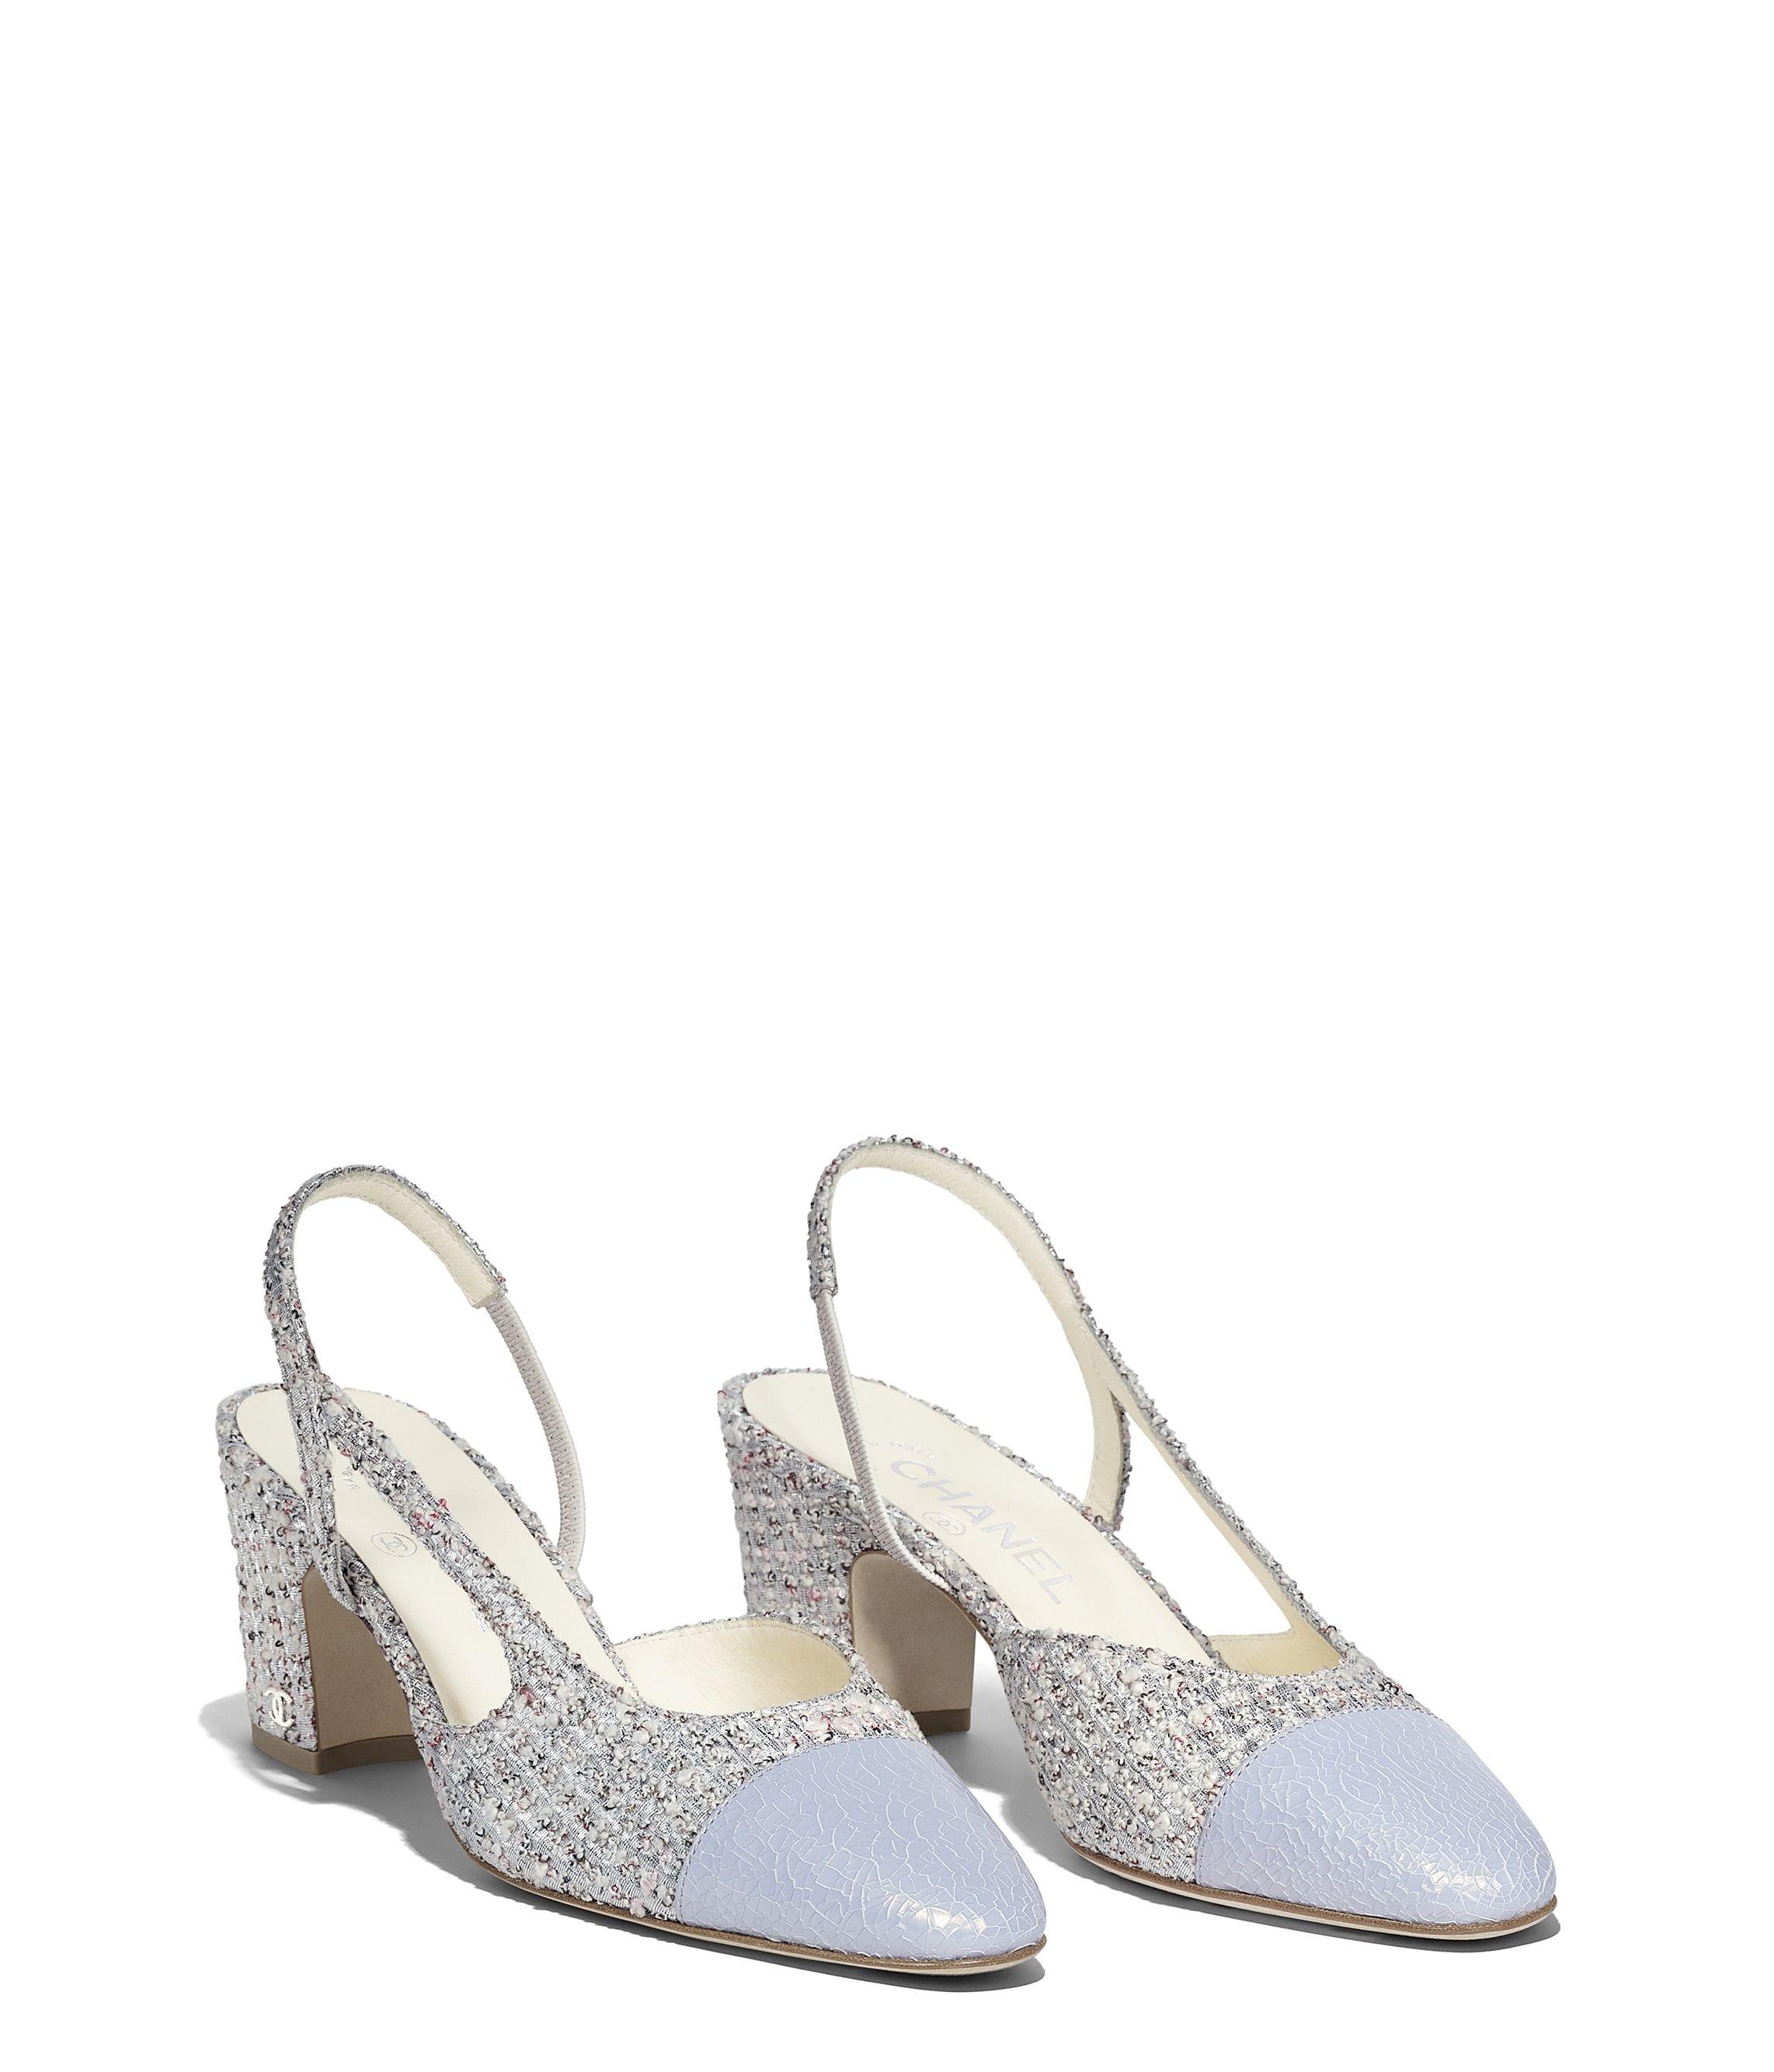 209d20cc7af Chanel - SS2018 | Beige, silver & gray tweed slingbacks | PUMPS in ...